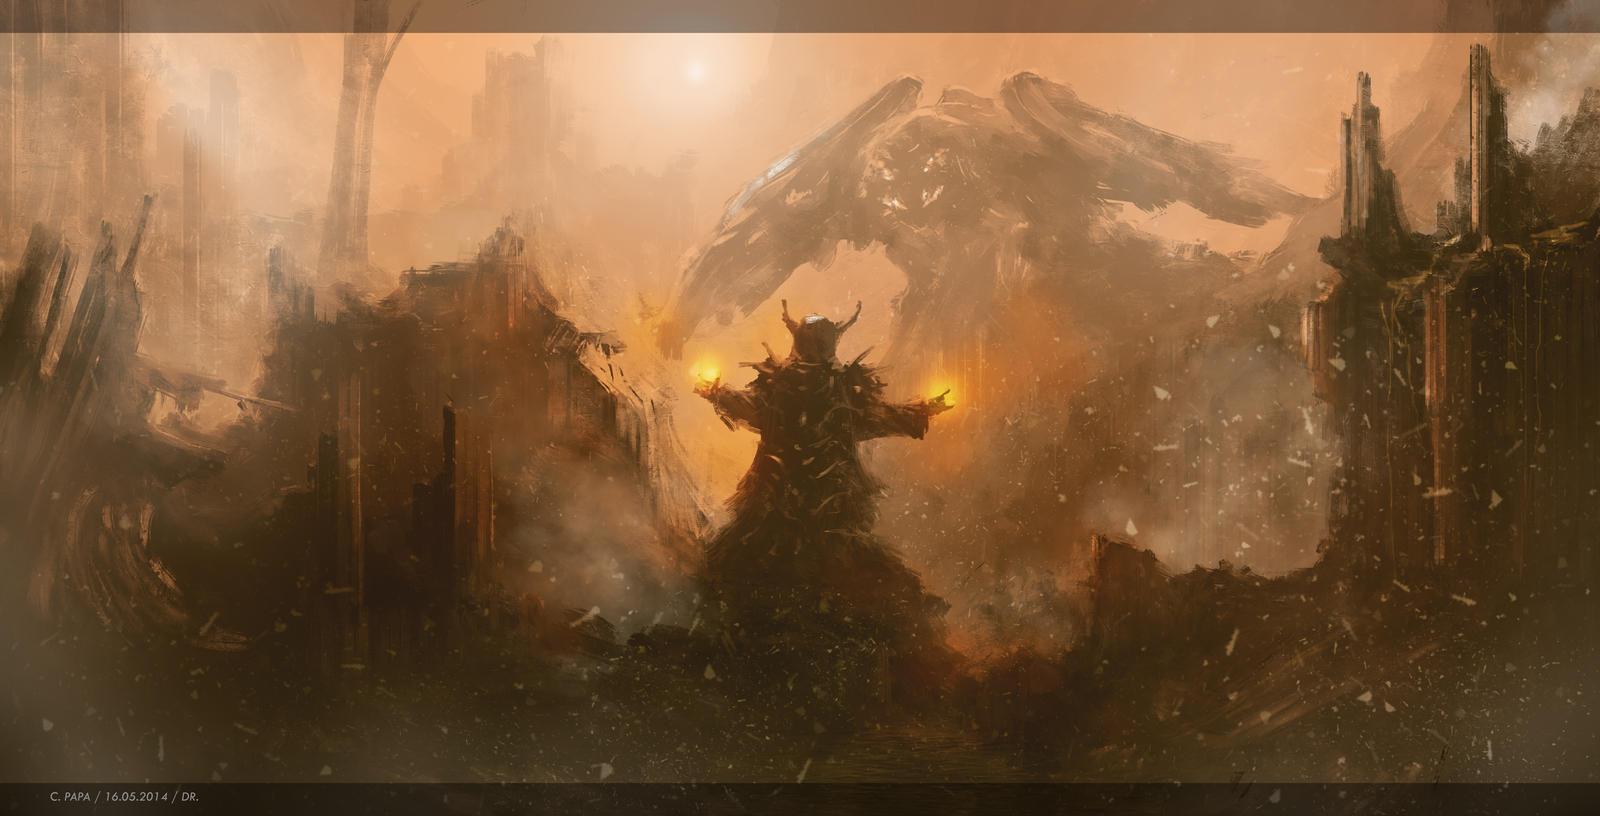 Warlocks Dragons: Dragon Vs Warlock By Azagth On DeviantArt